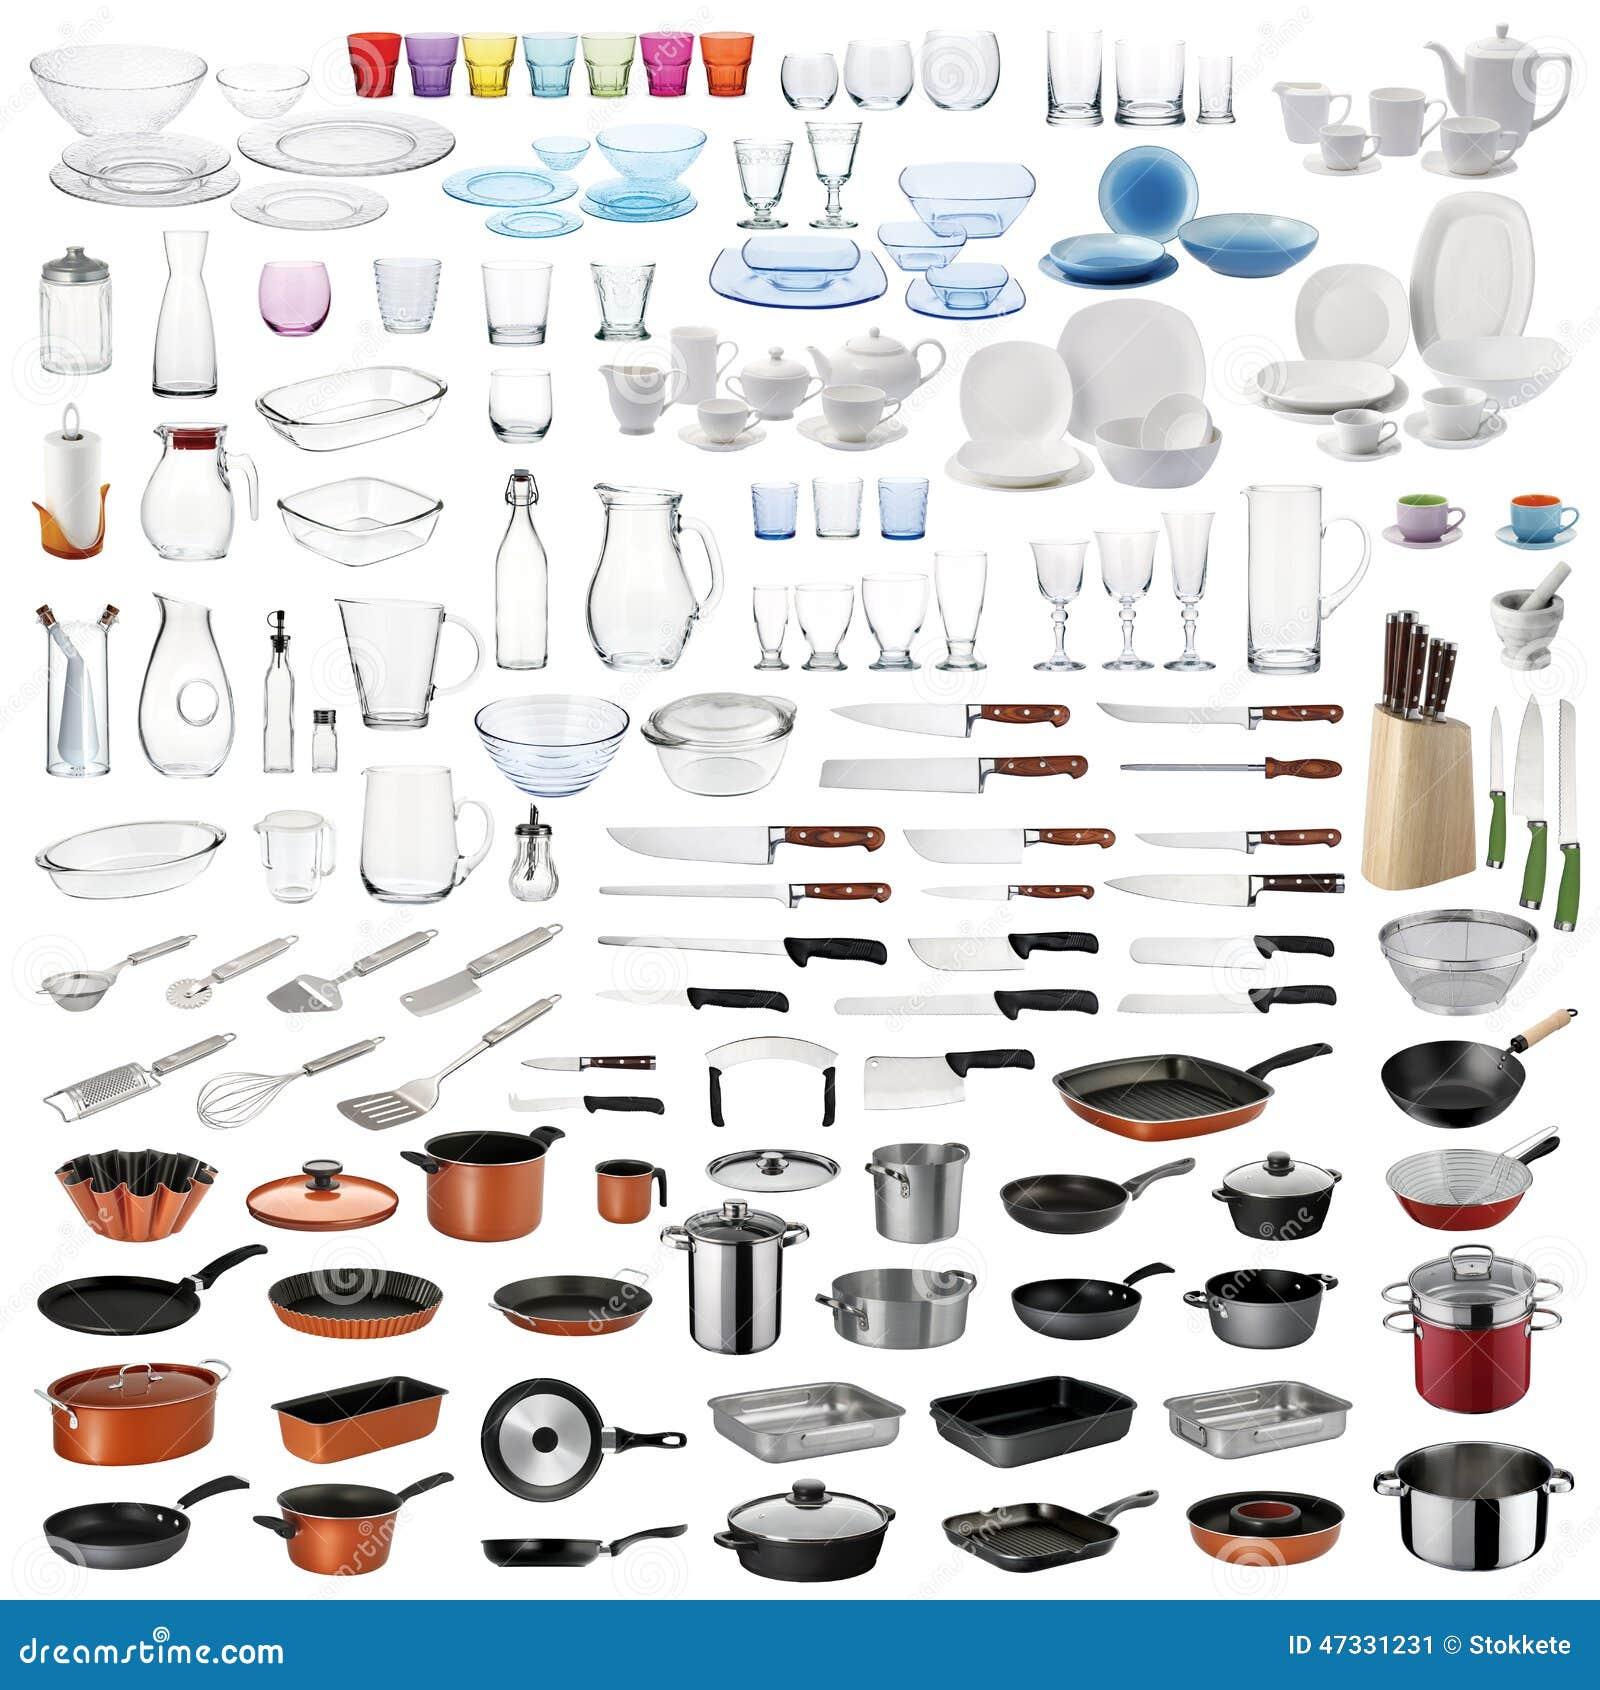 Utensilios de la cocina fijados imagen de archivo imagen de bloque cristaler a 47331231 - Liste ustensile de cuisine ...